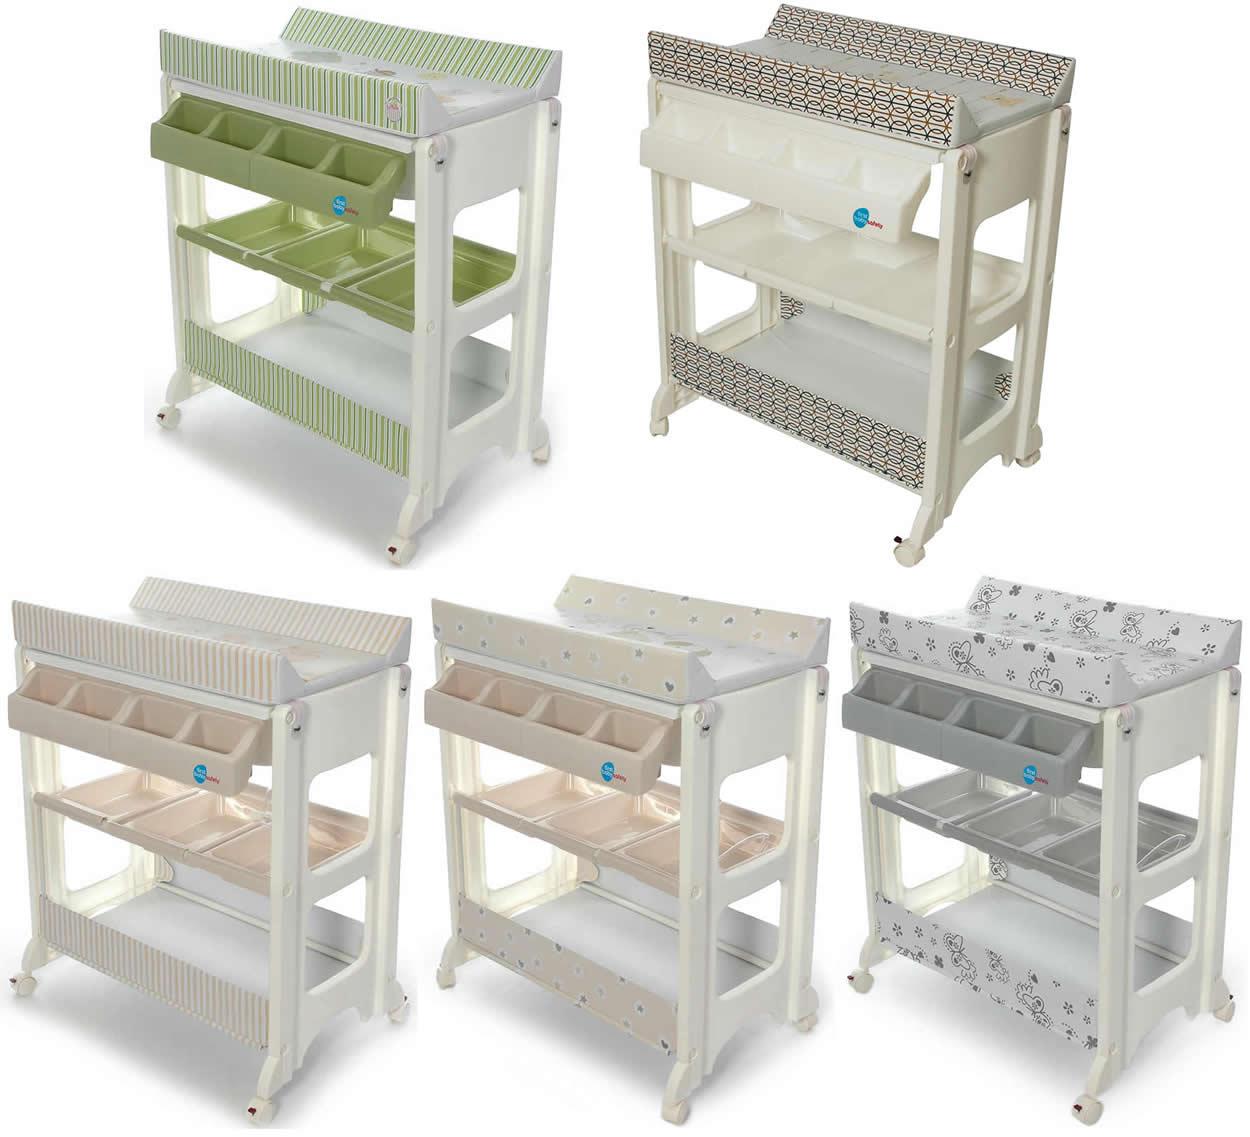 bade wickel kombination wickeltisch babywanne fahrbar ebay. Black Bedroom Furniture Sets. Home Design Ideas